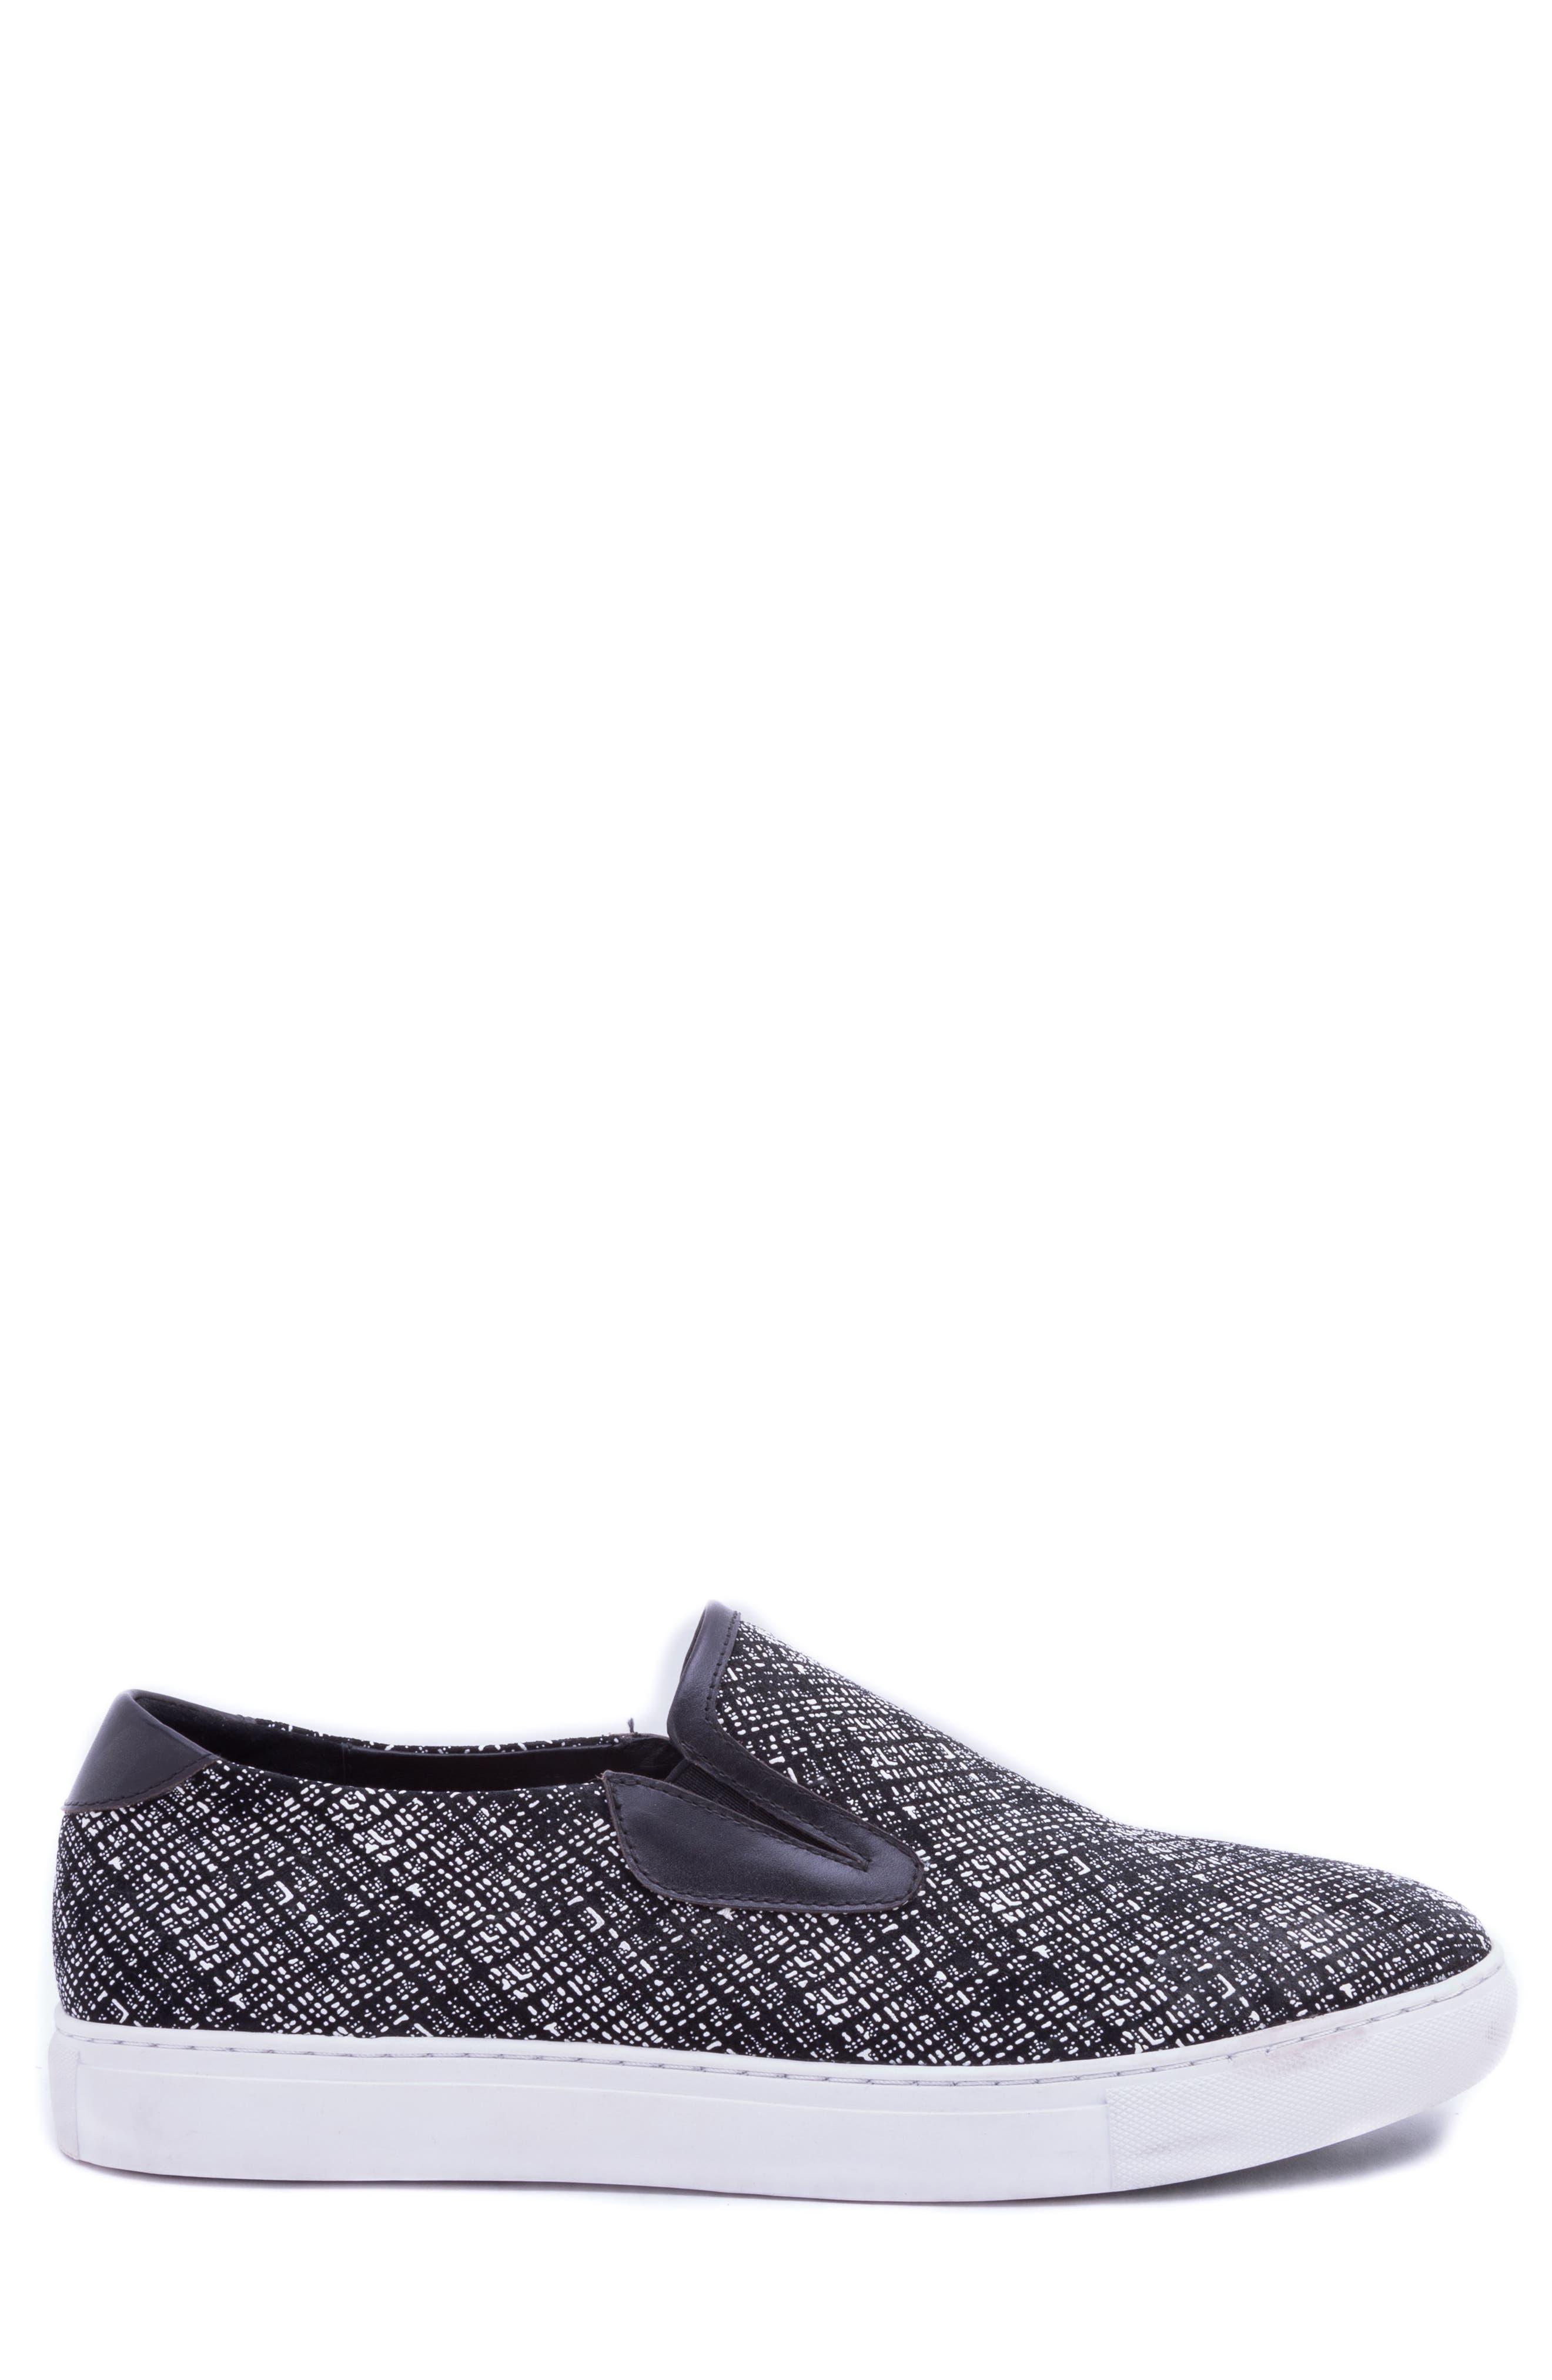 Kitson Slip-On Sneaker,                             Alternate thumbnail 3, color,                             BLACK SUEDE